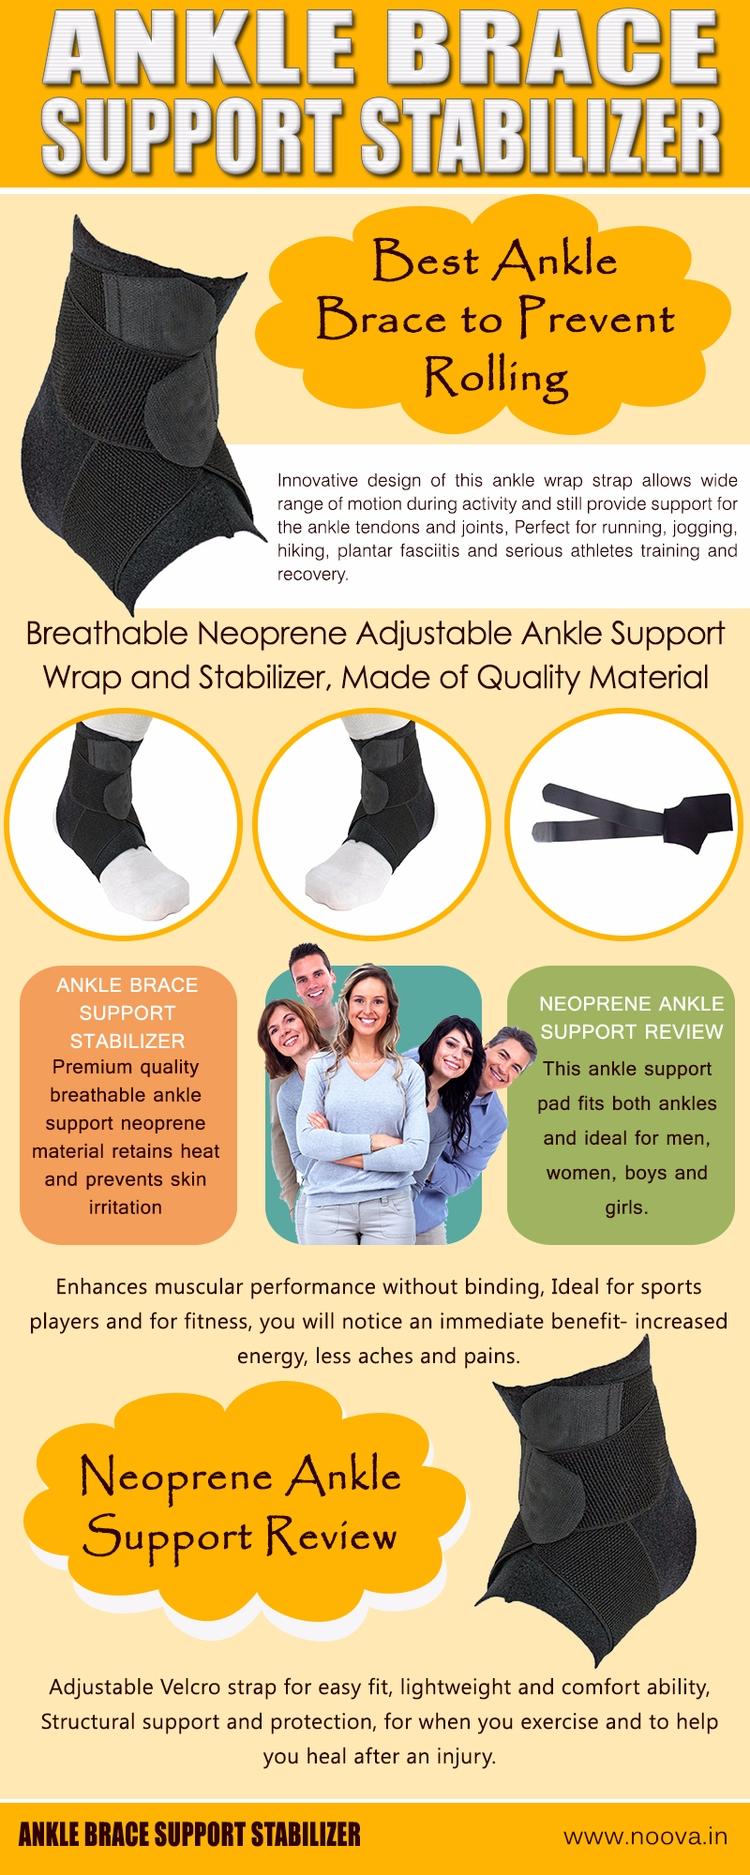 ankle iced immediately, elevate - kneesupportrunning | ello